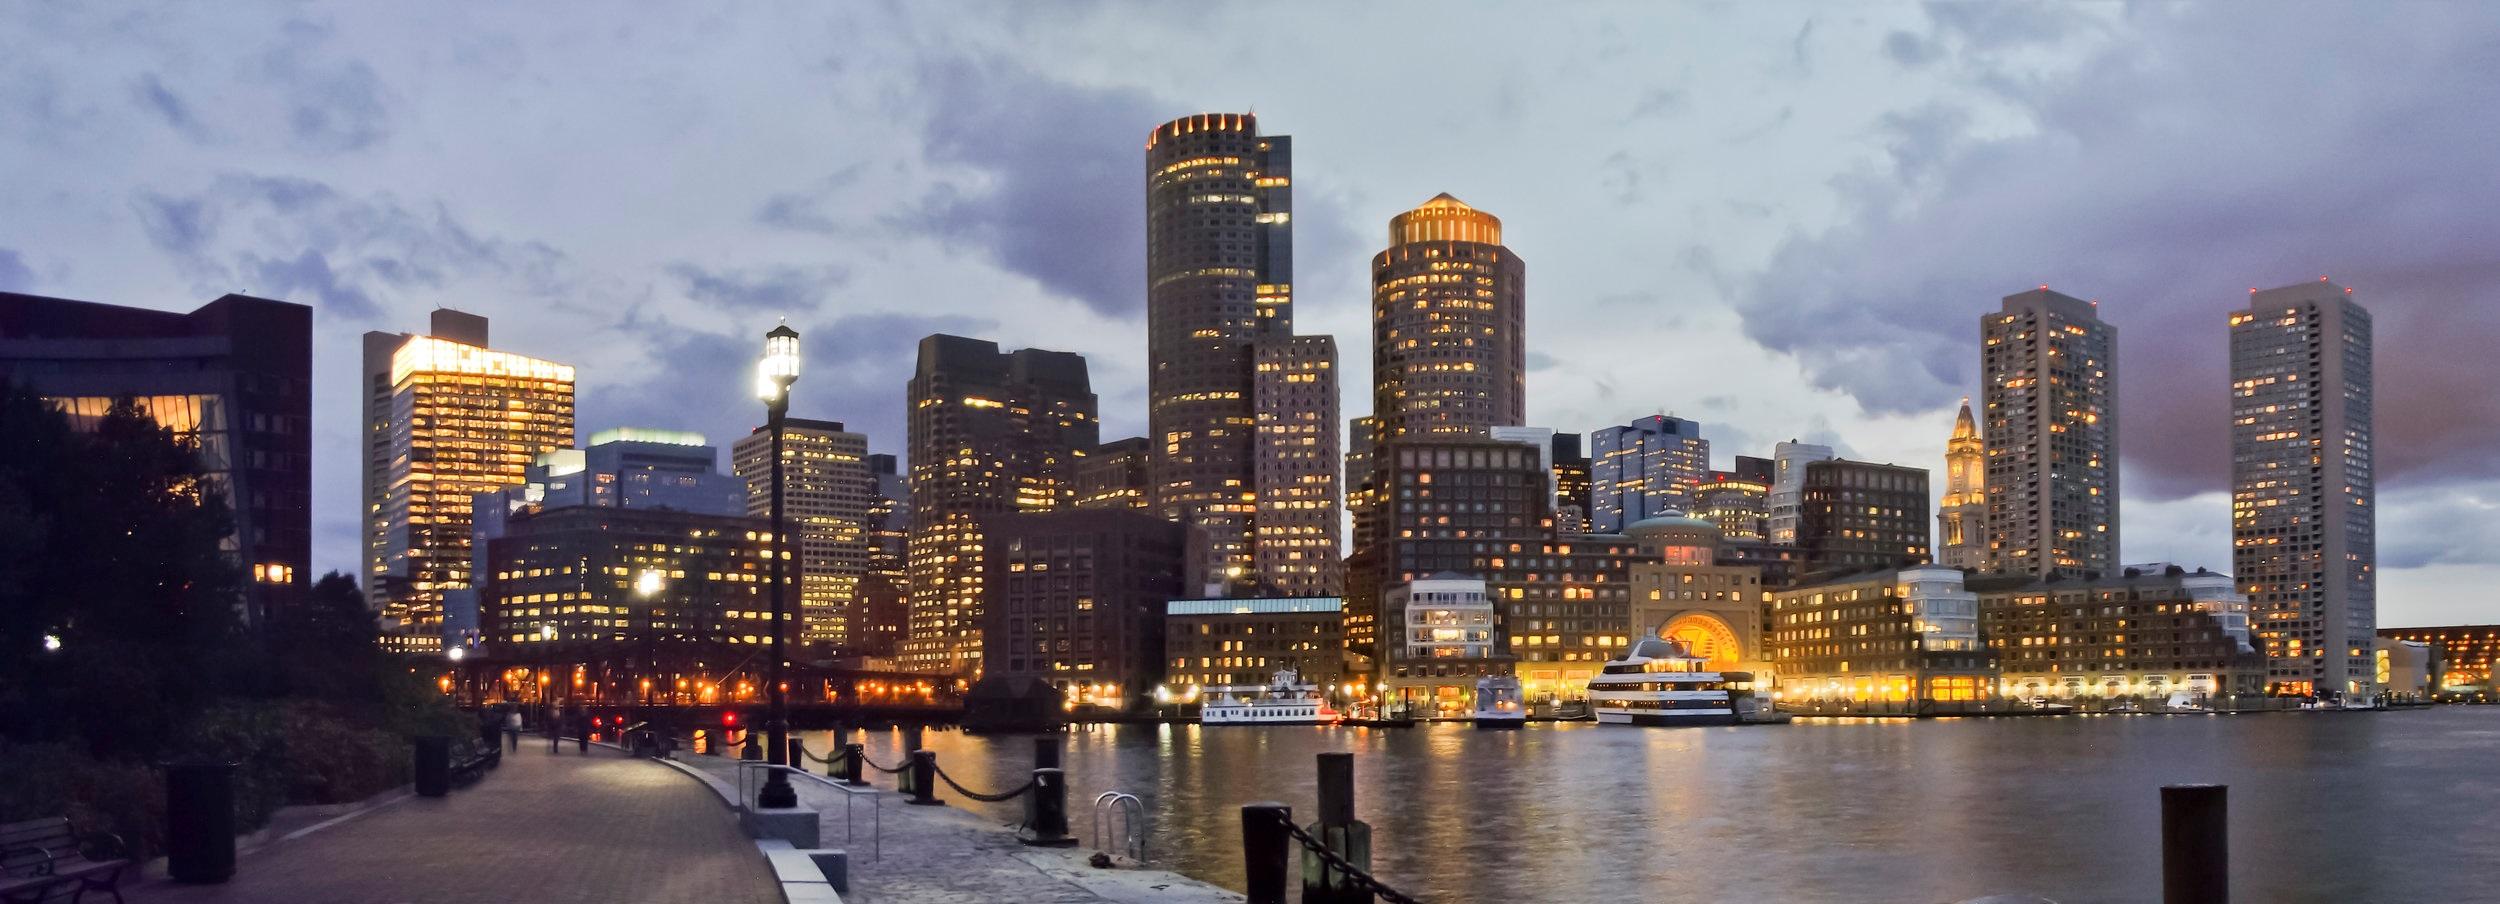 boston-rose-wharf.jpg